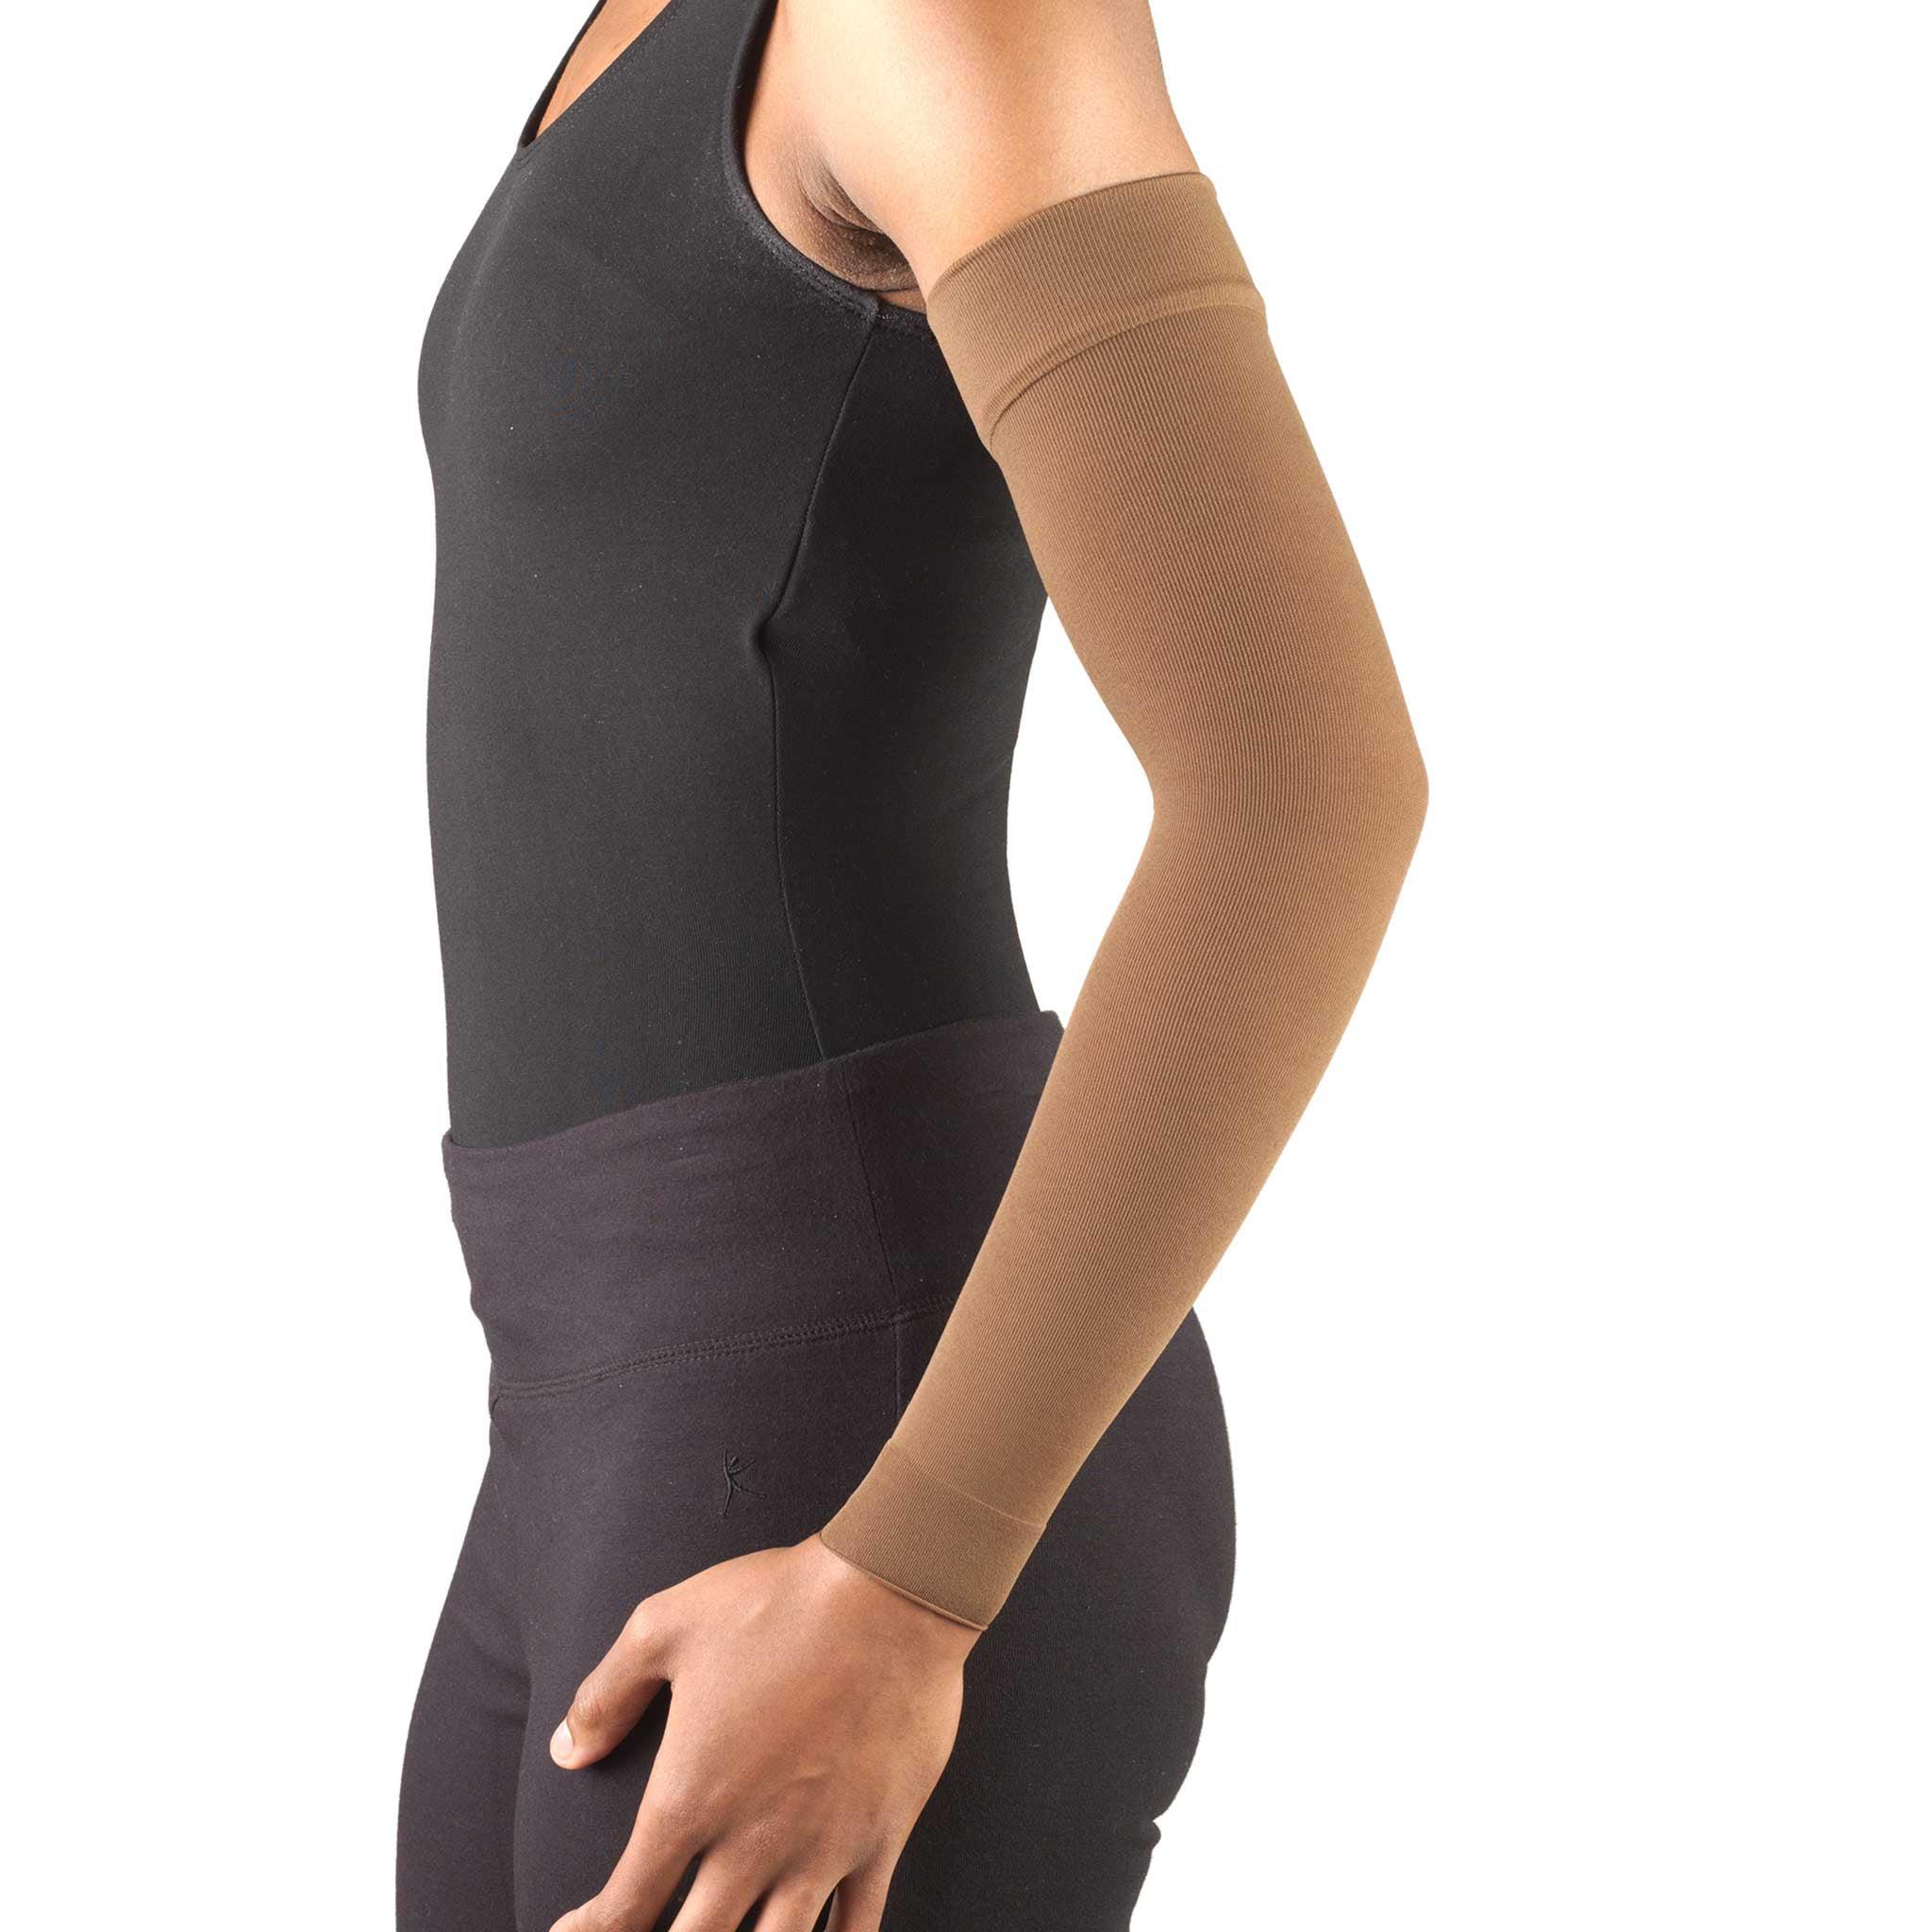 Truform Lymphedema Compression Arm Sleeve: 20-30 mmHg, Brown, Large